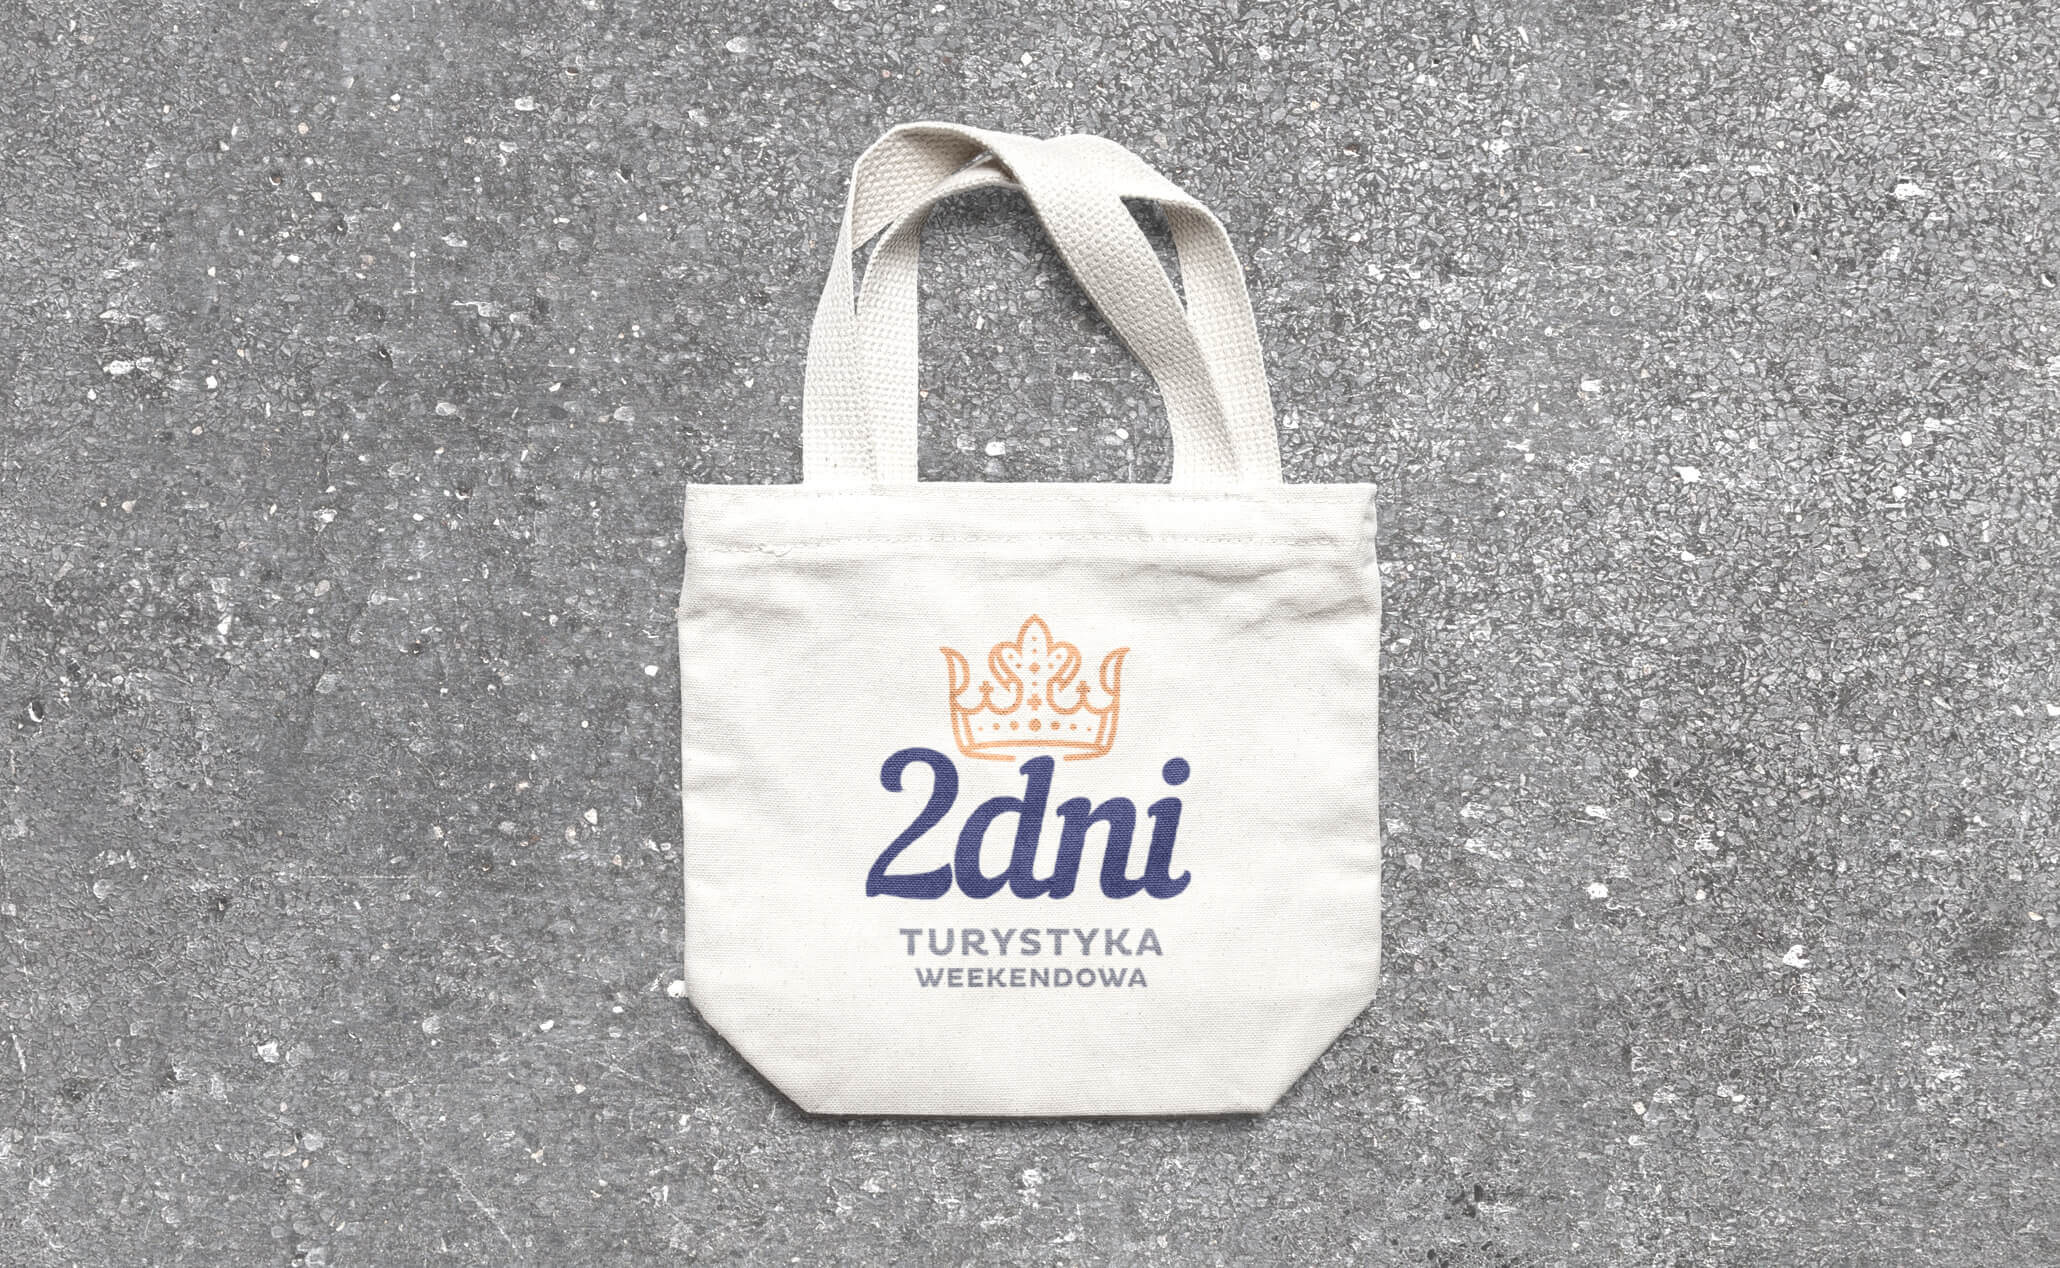 two-days-shopping-bag-design